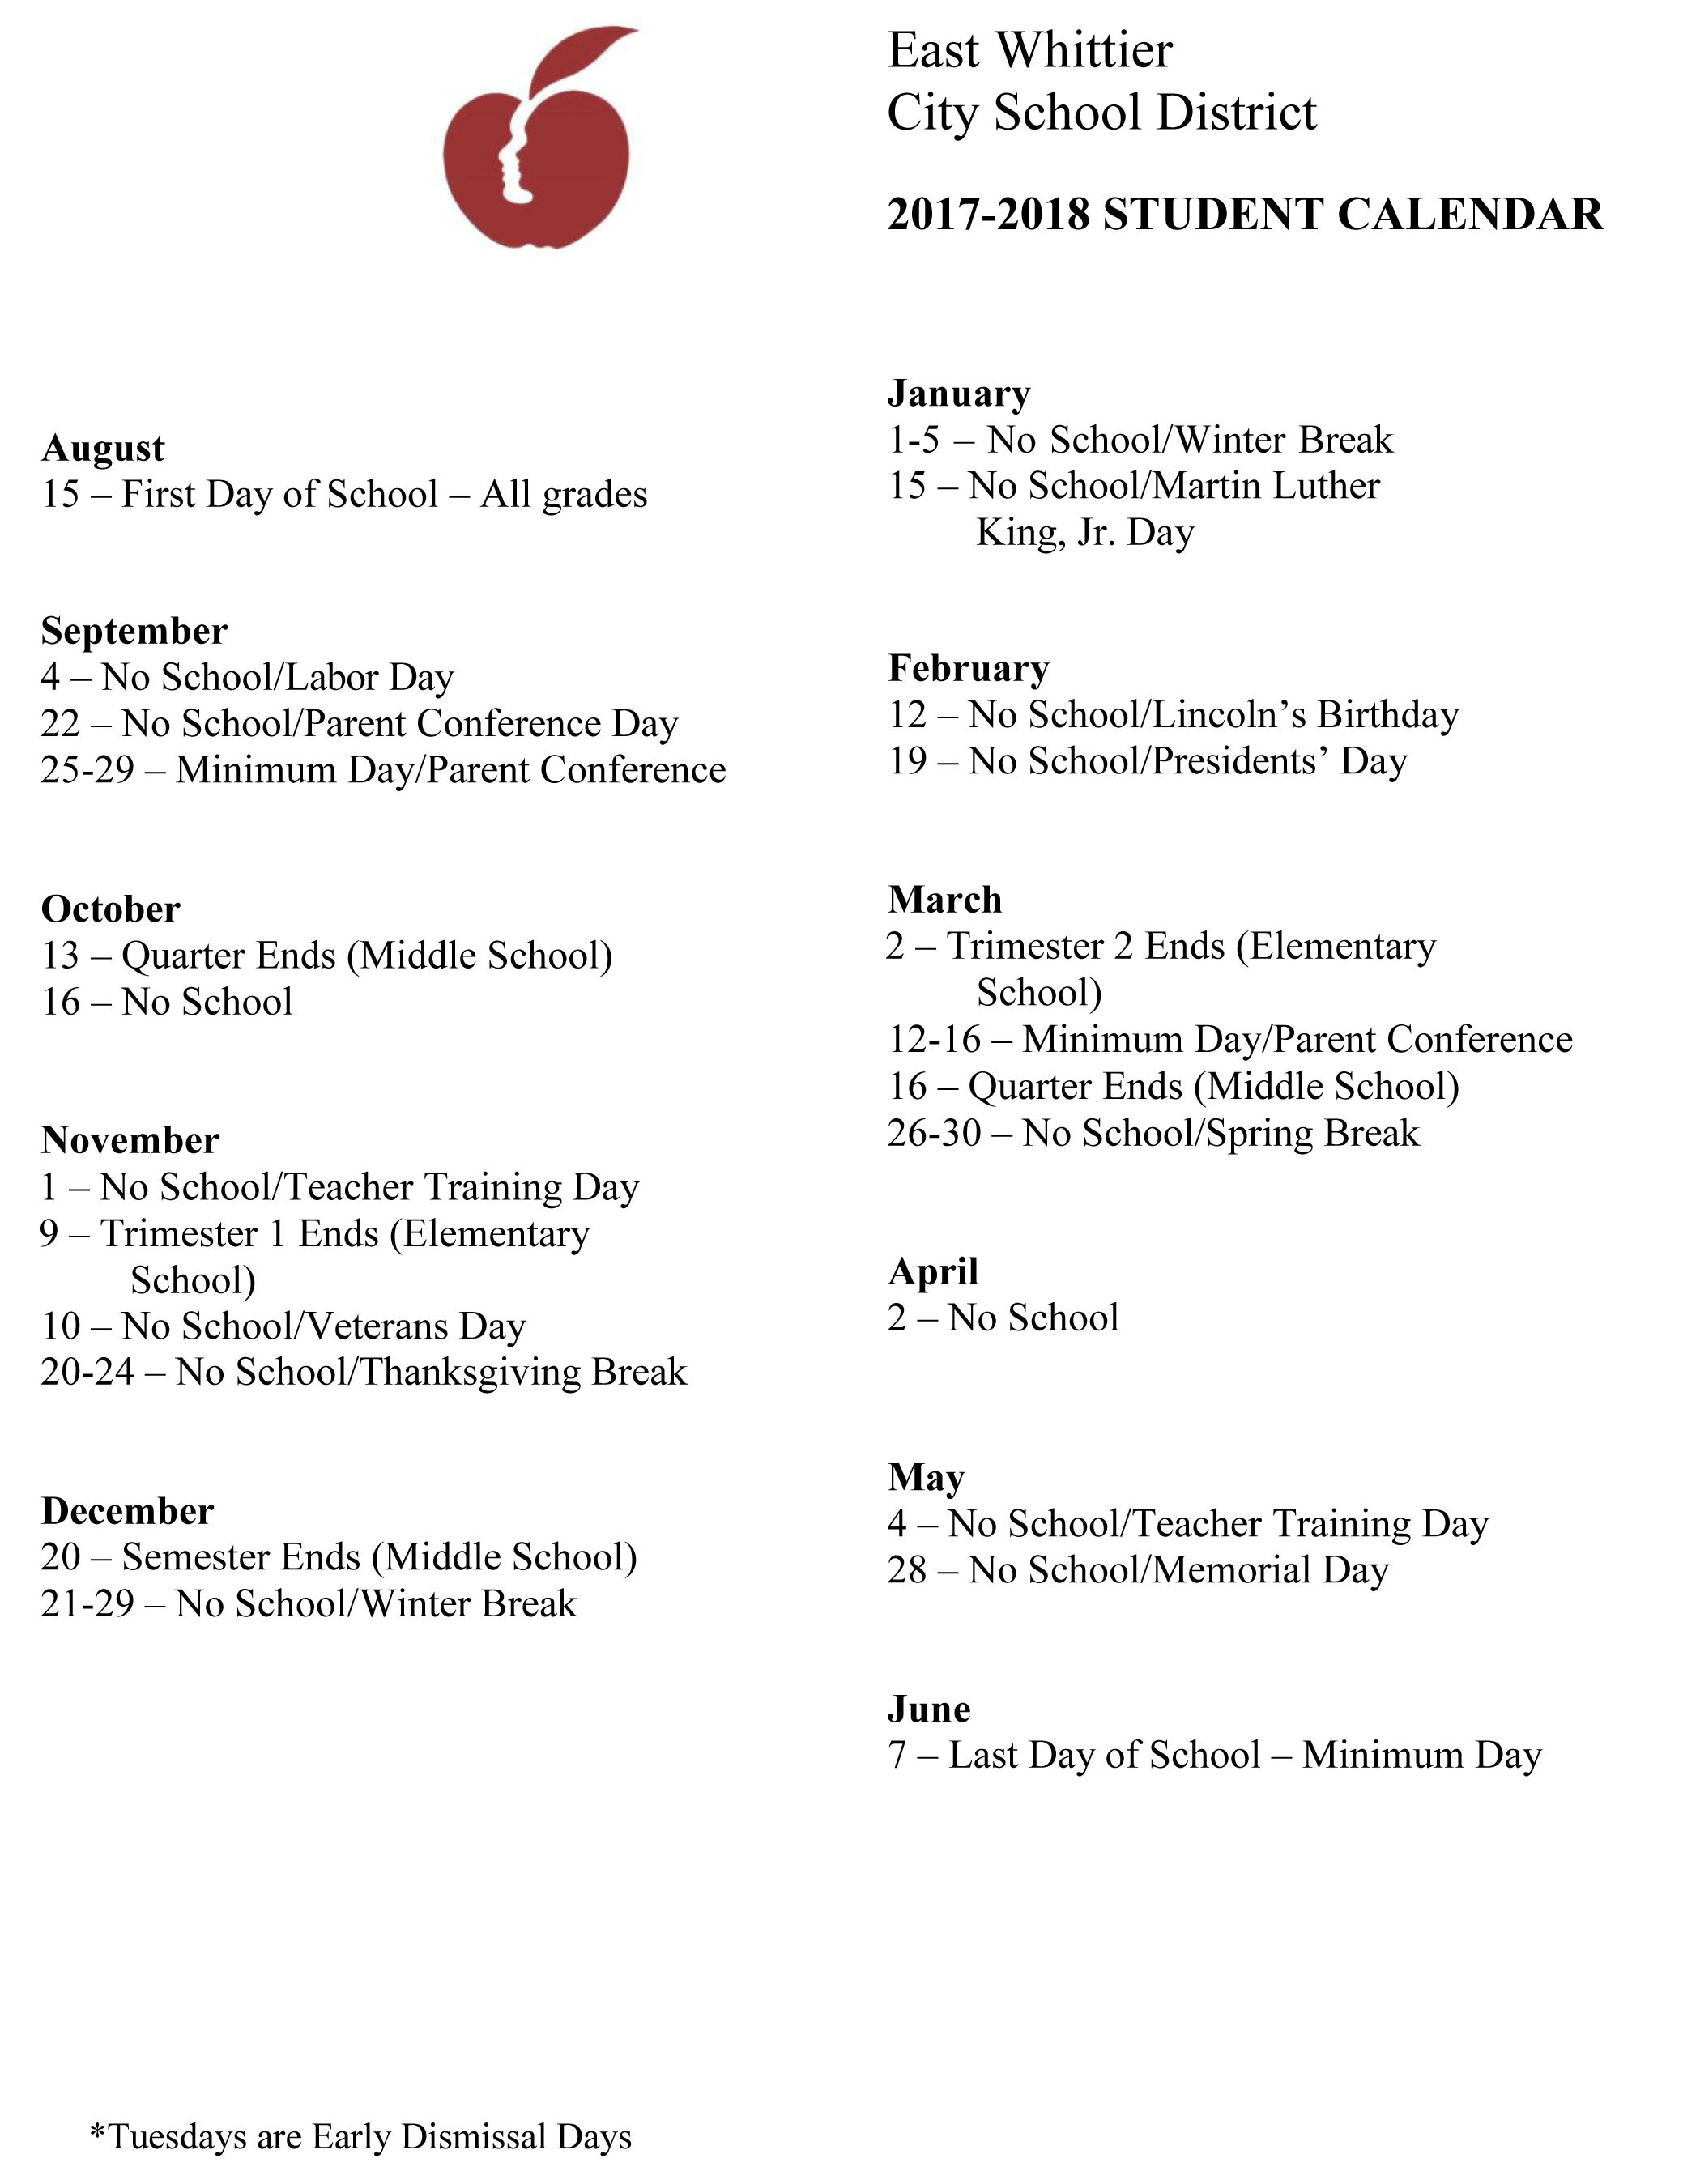 2017-18 Student Calendar